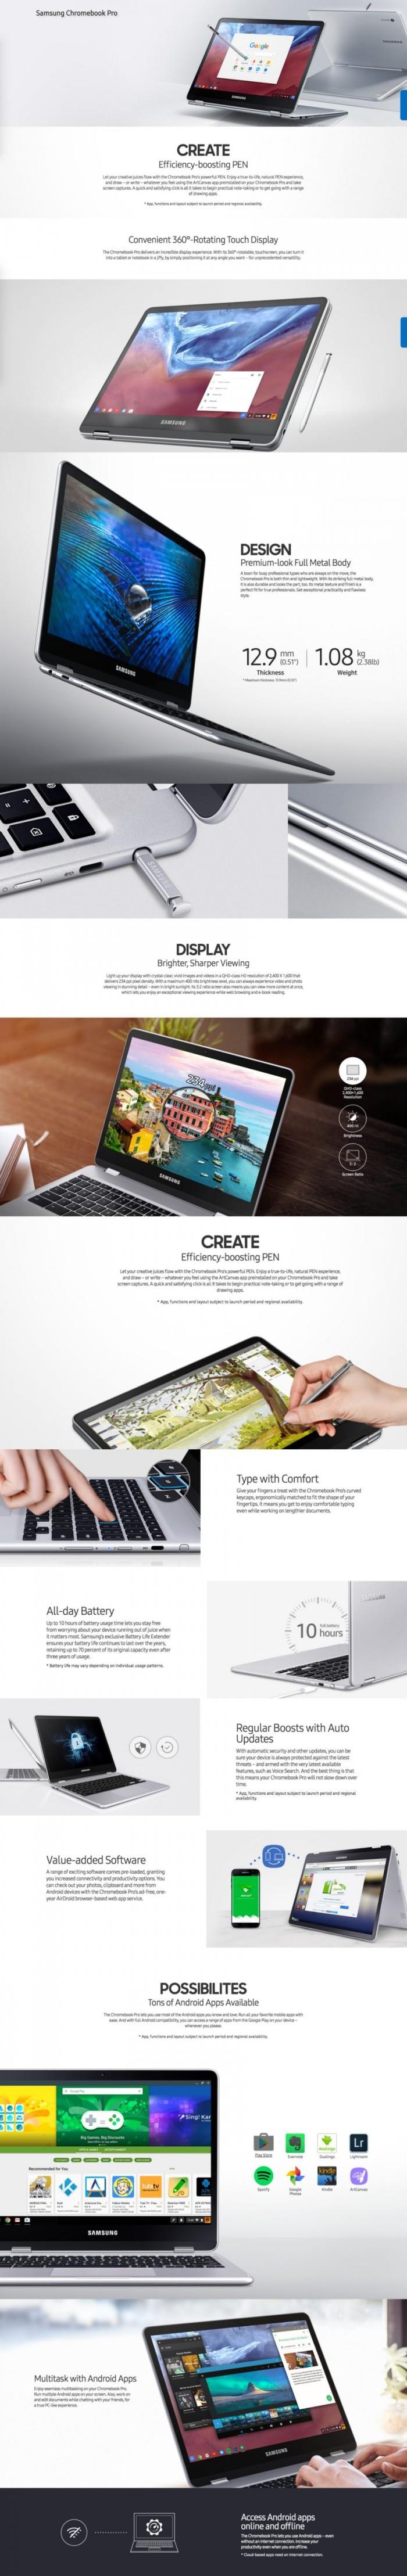 Samsung-Chromebook-Pro-detalles